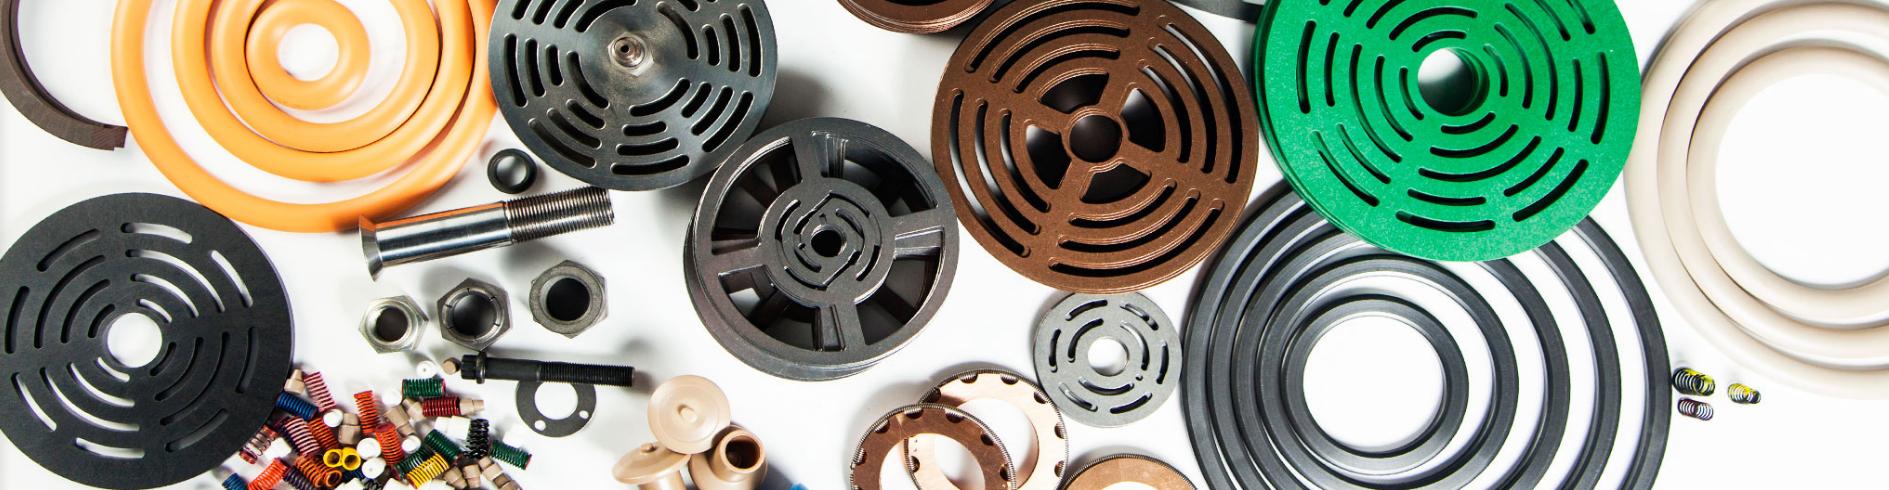 A Complete List Of Compressor Valve Parts-KB Delta